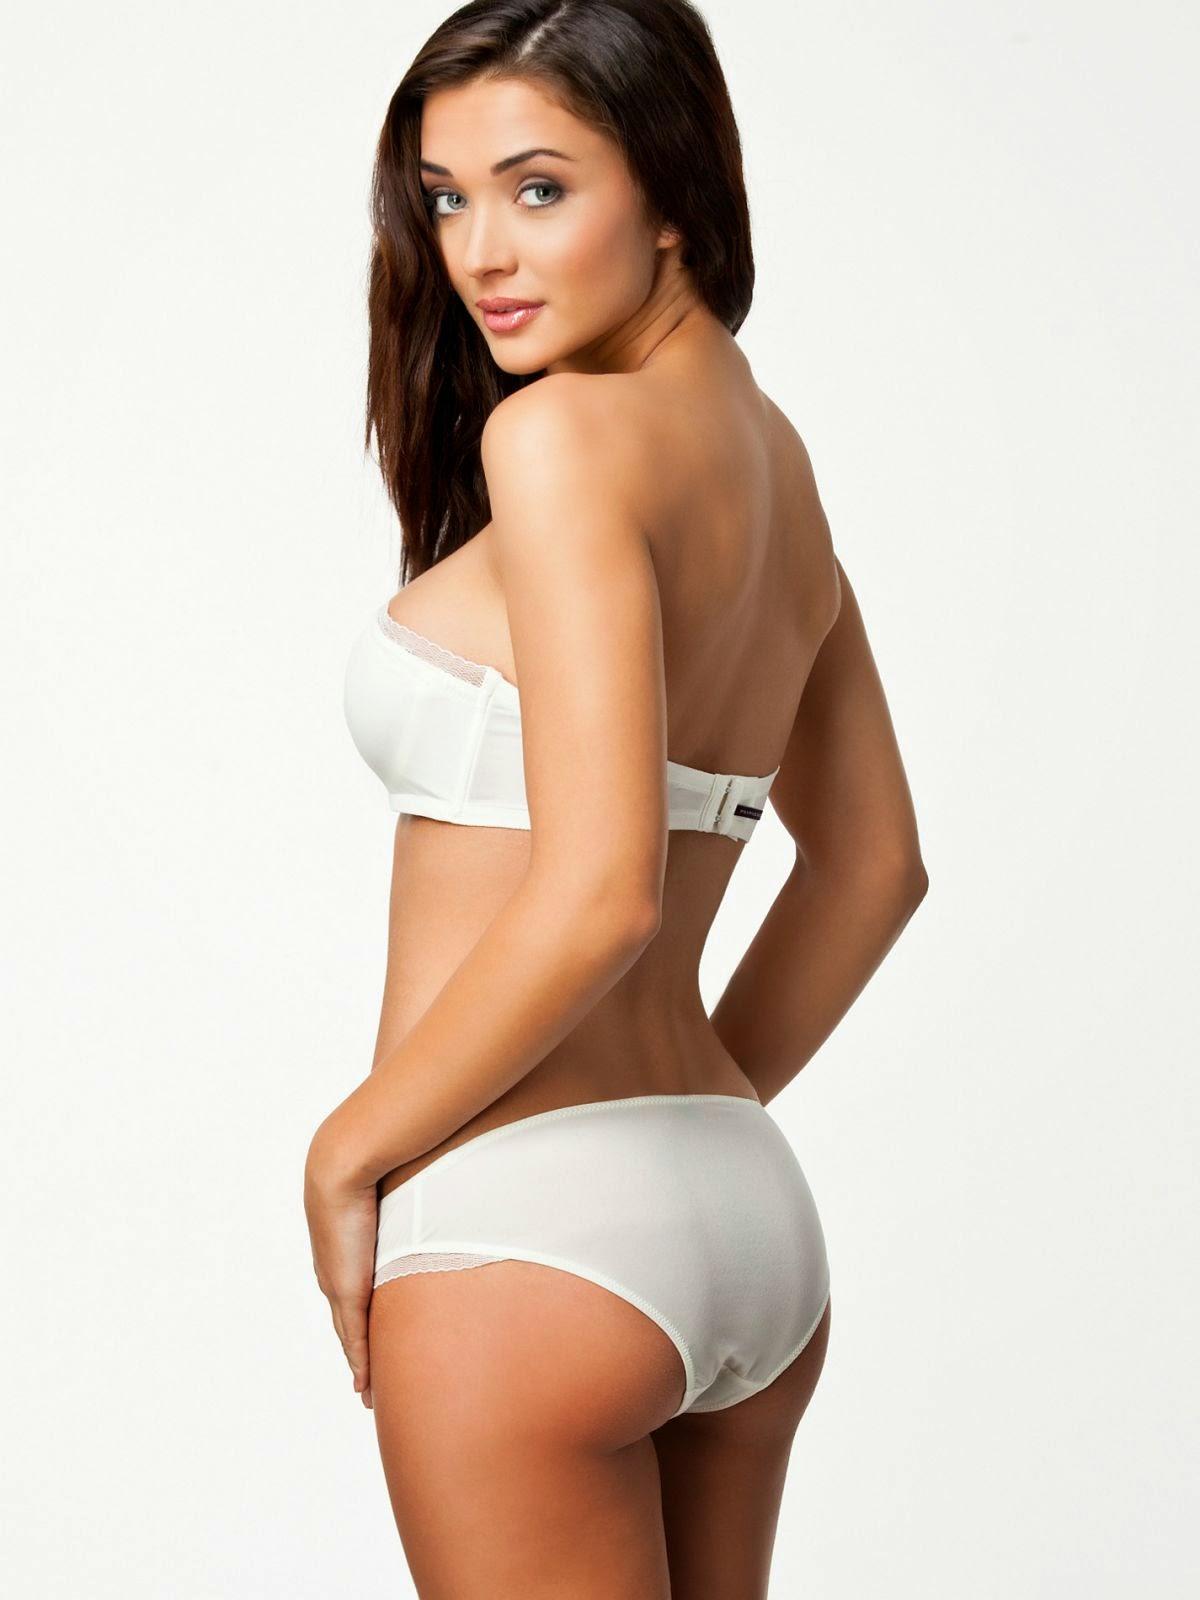 Amy Jackson Erotic Bikini Photoshoot For Nelly Swimwear